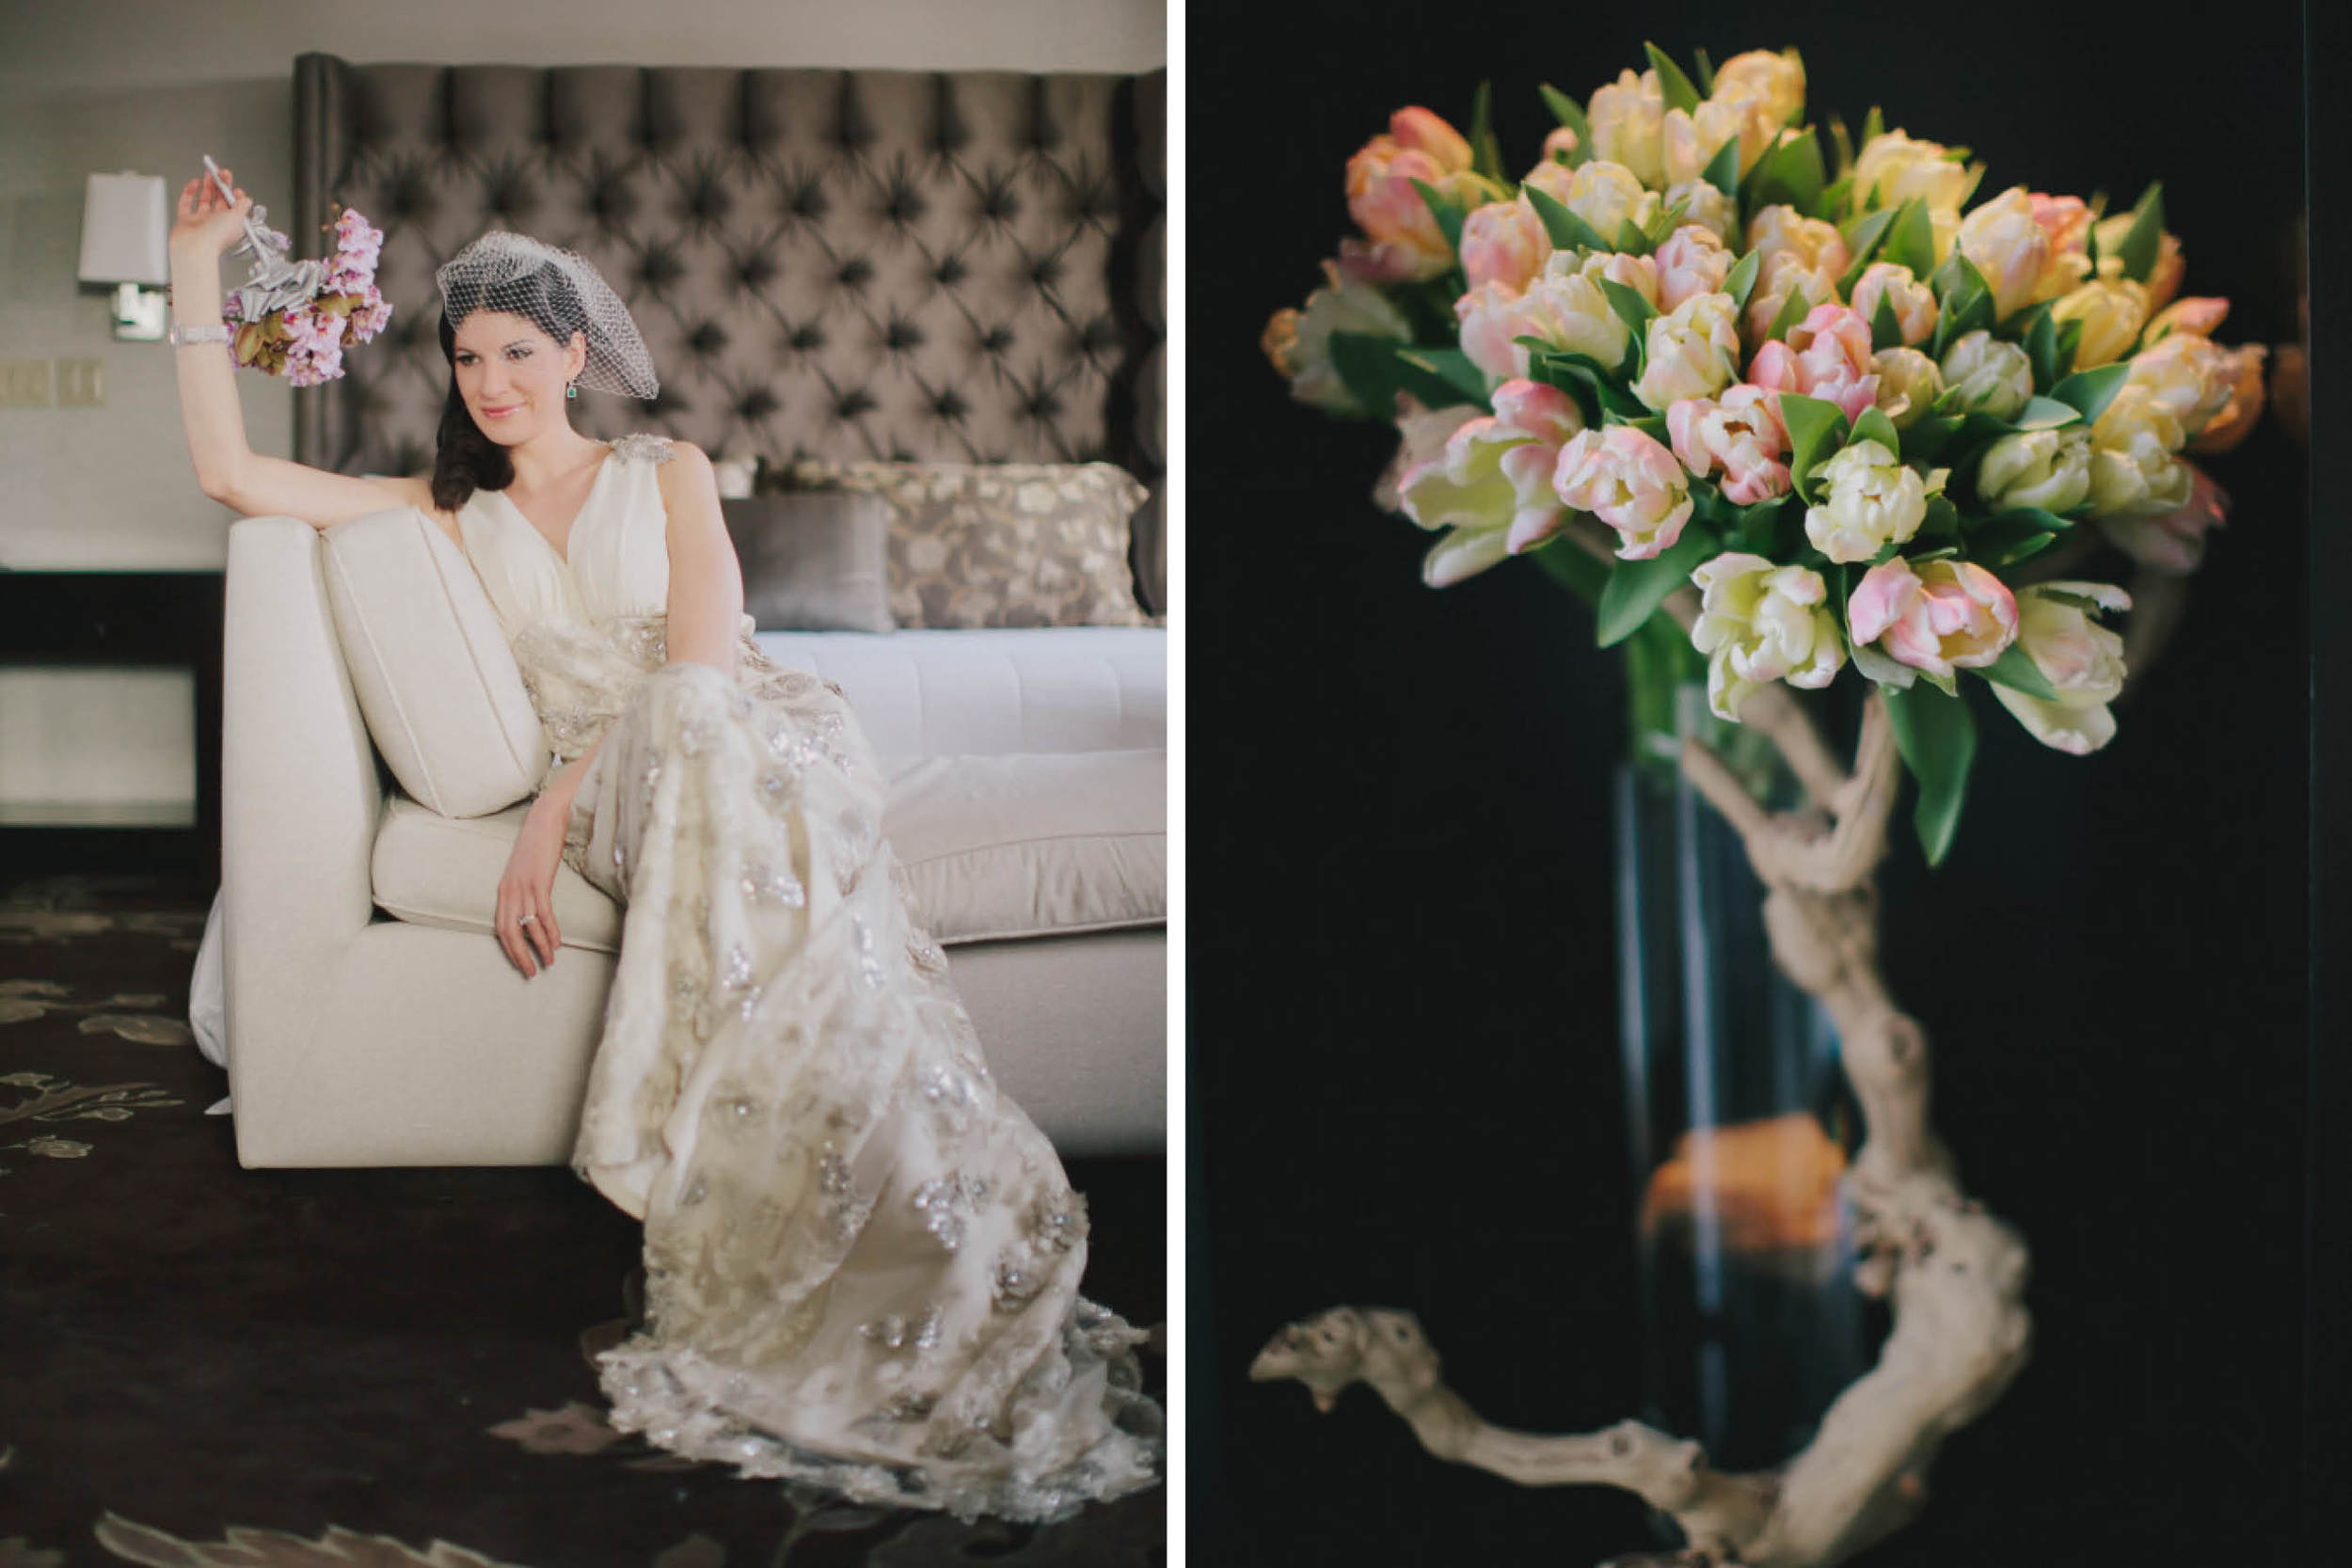 alegria-by-design-wedding-planner-coordinator-santa-barbara-montecito-inn-penthouse (10).jpg